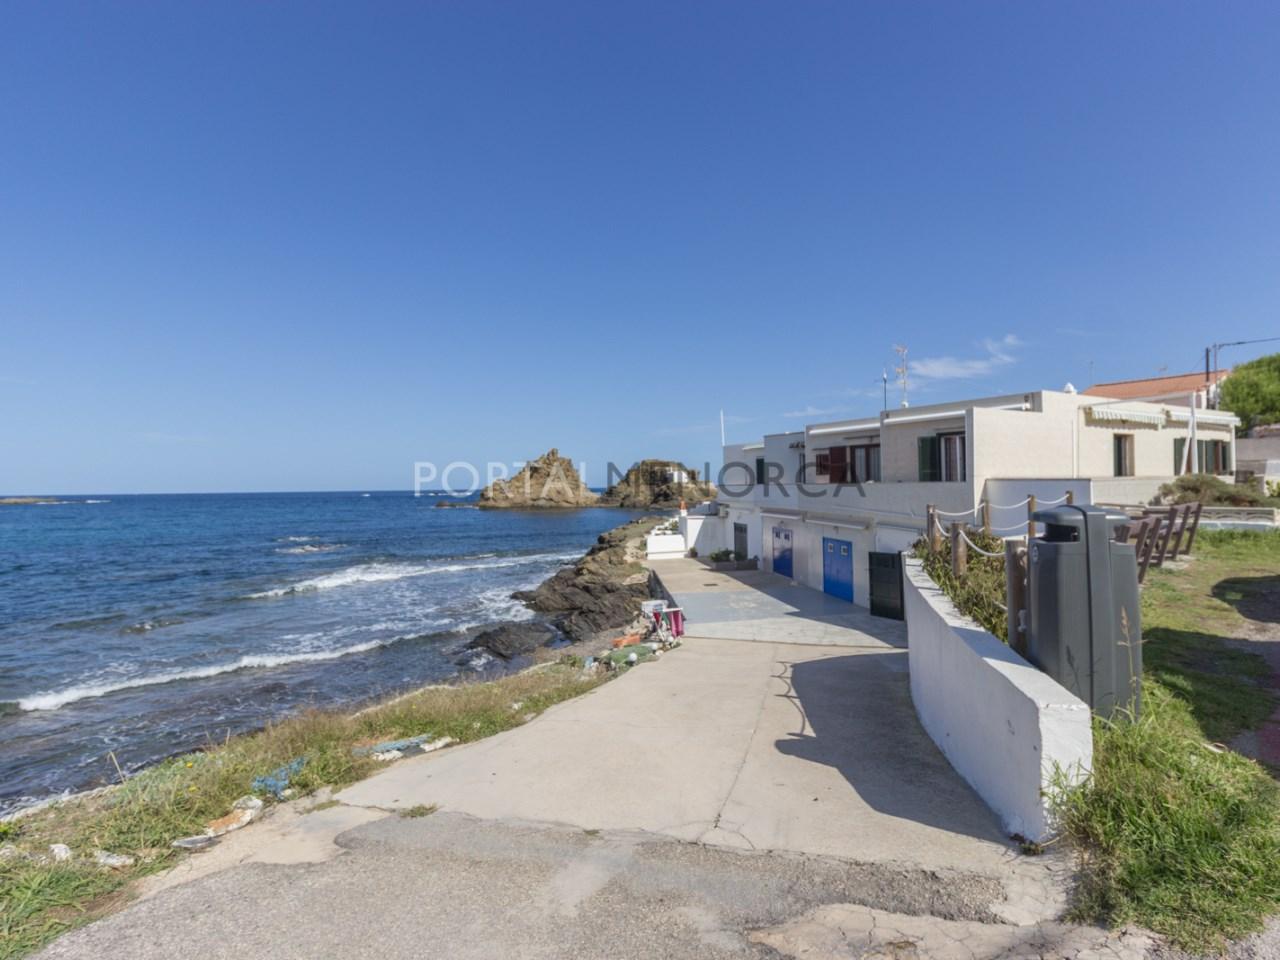 maison bord du mer a cala mesquida, Minorque (15 de 15)